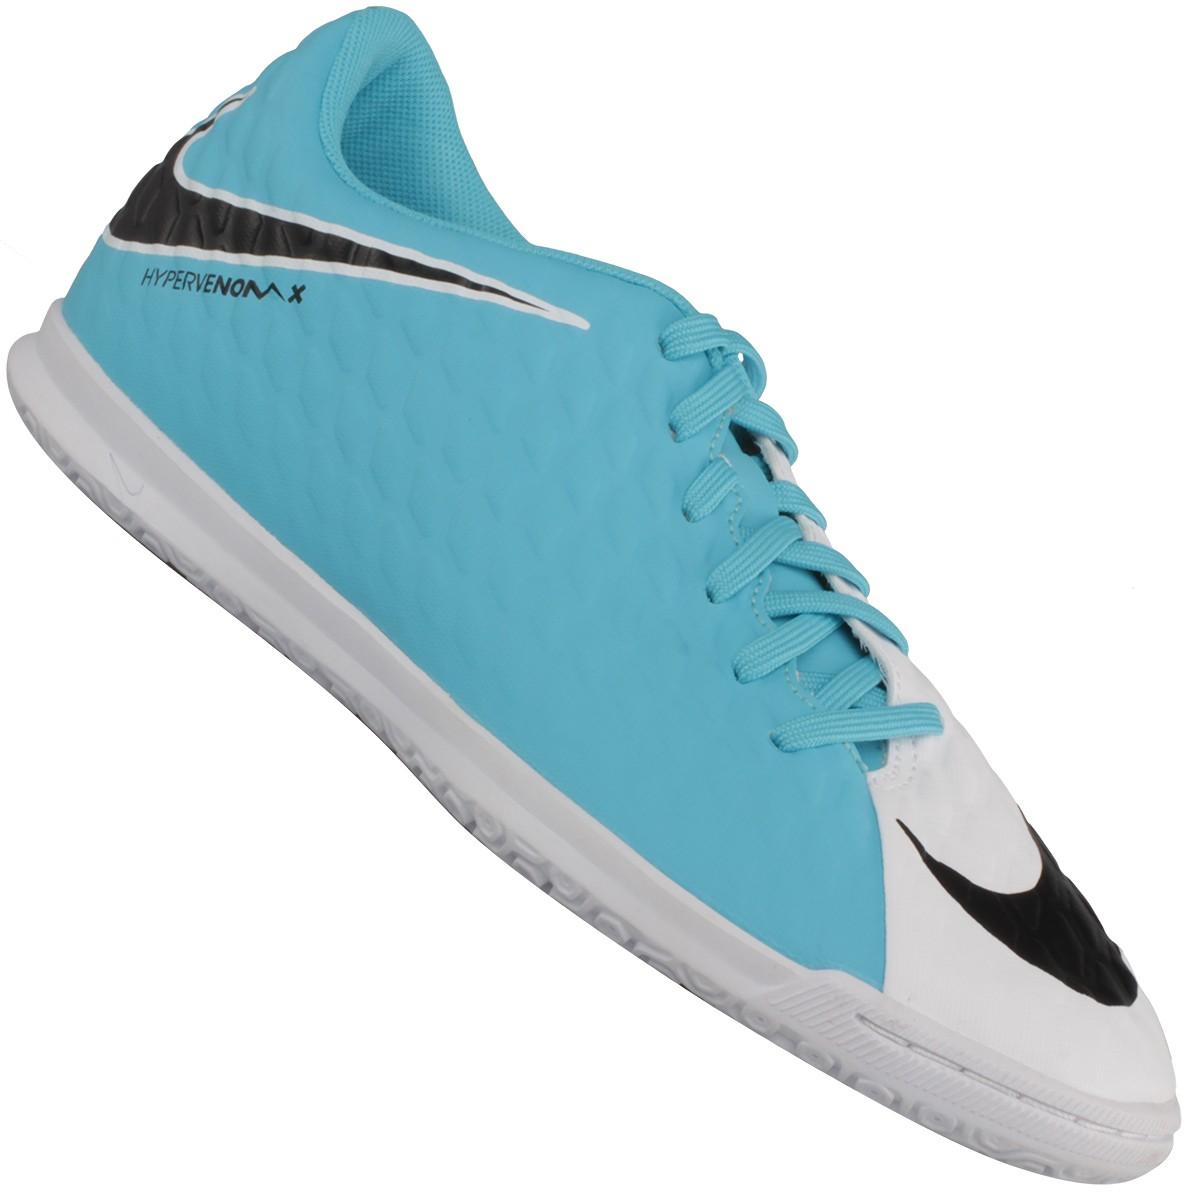 ... buy tênis nike hypervenom phade 3 ic futsal 9f0e9 9d9e1 9cc56deb39111